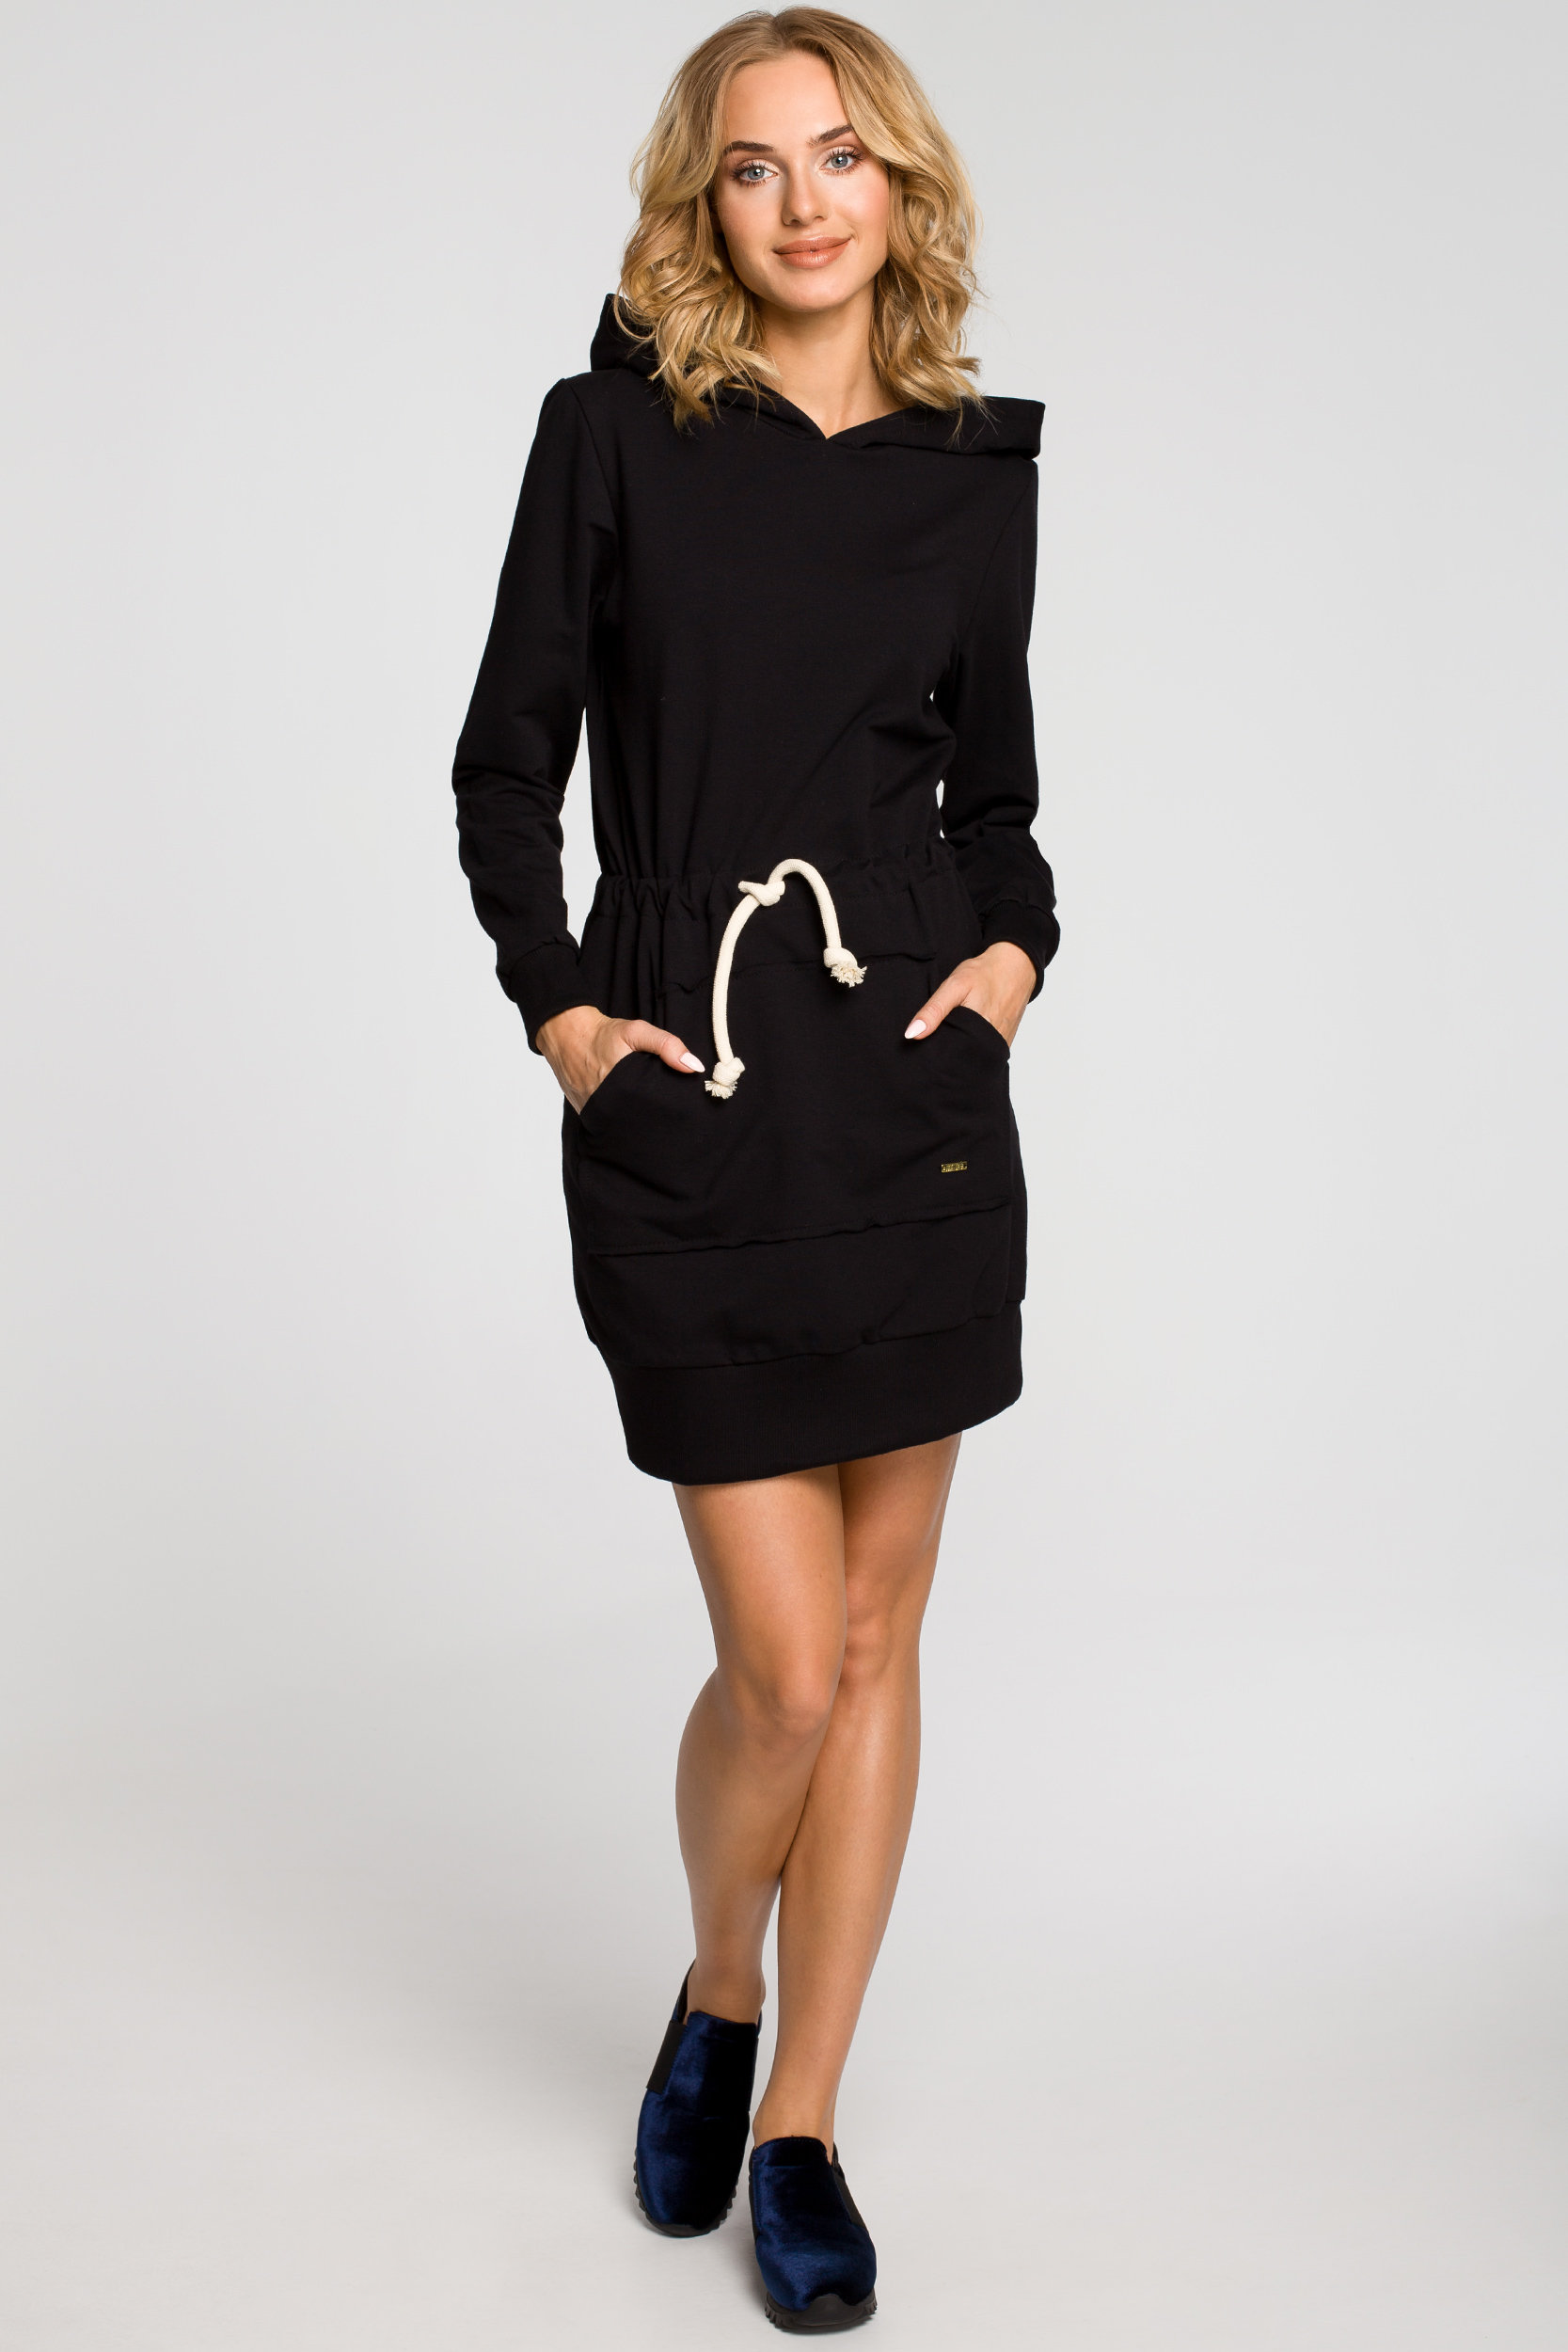 5c6935cd39 CM0985 Dresowa sukienka kangurka z kapturem - czarna ...